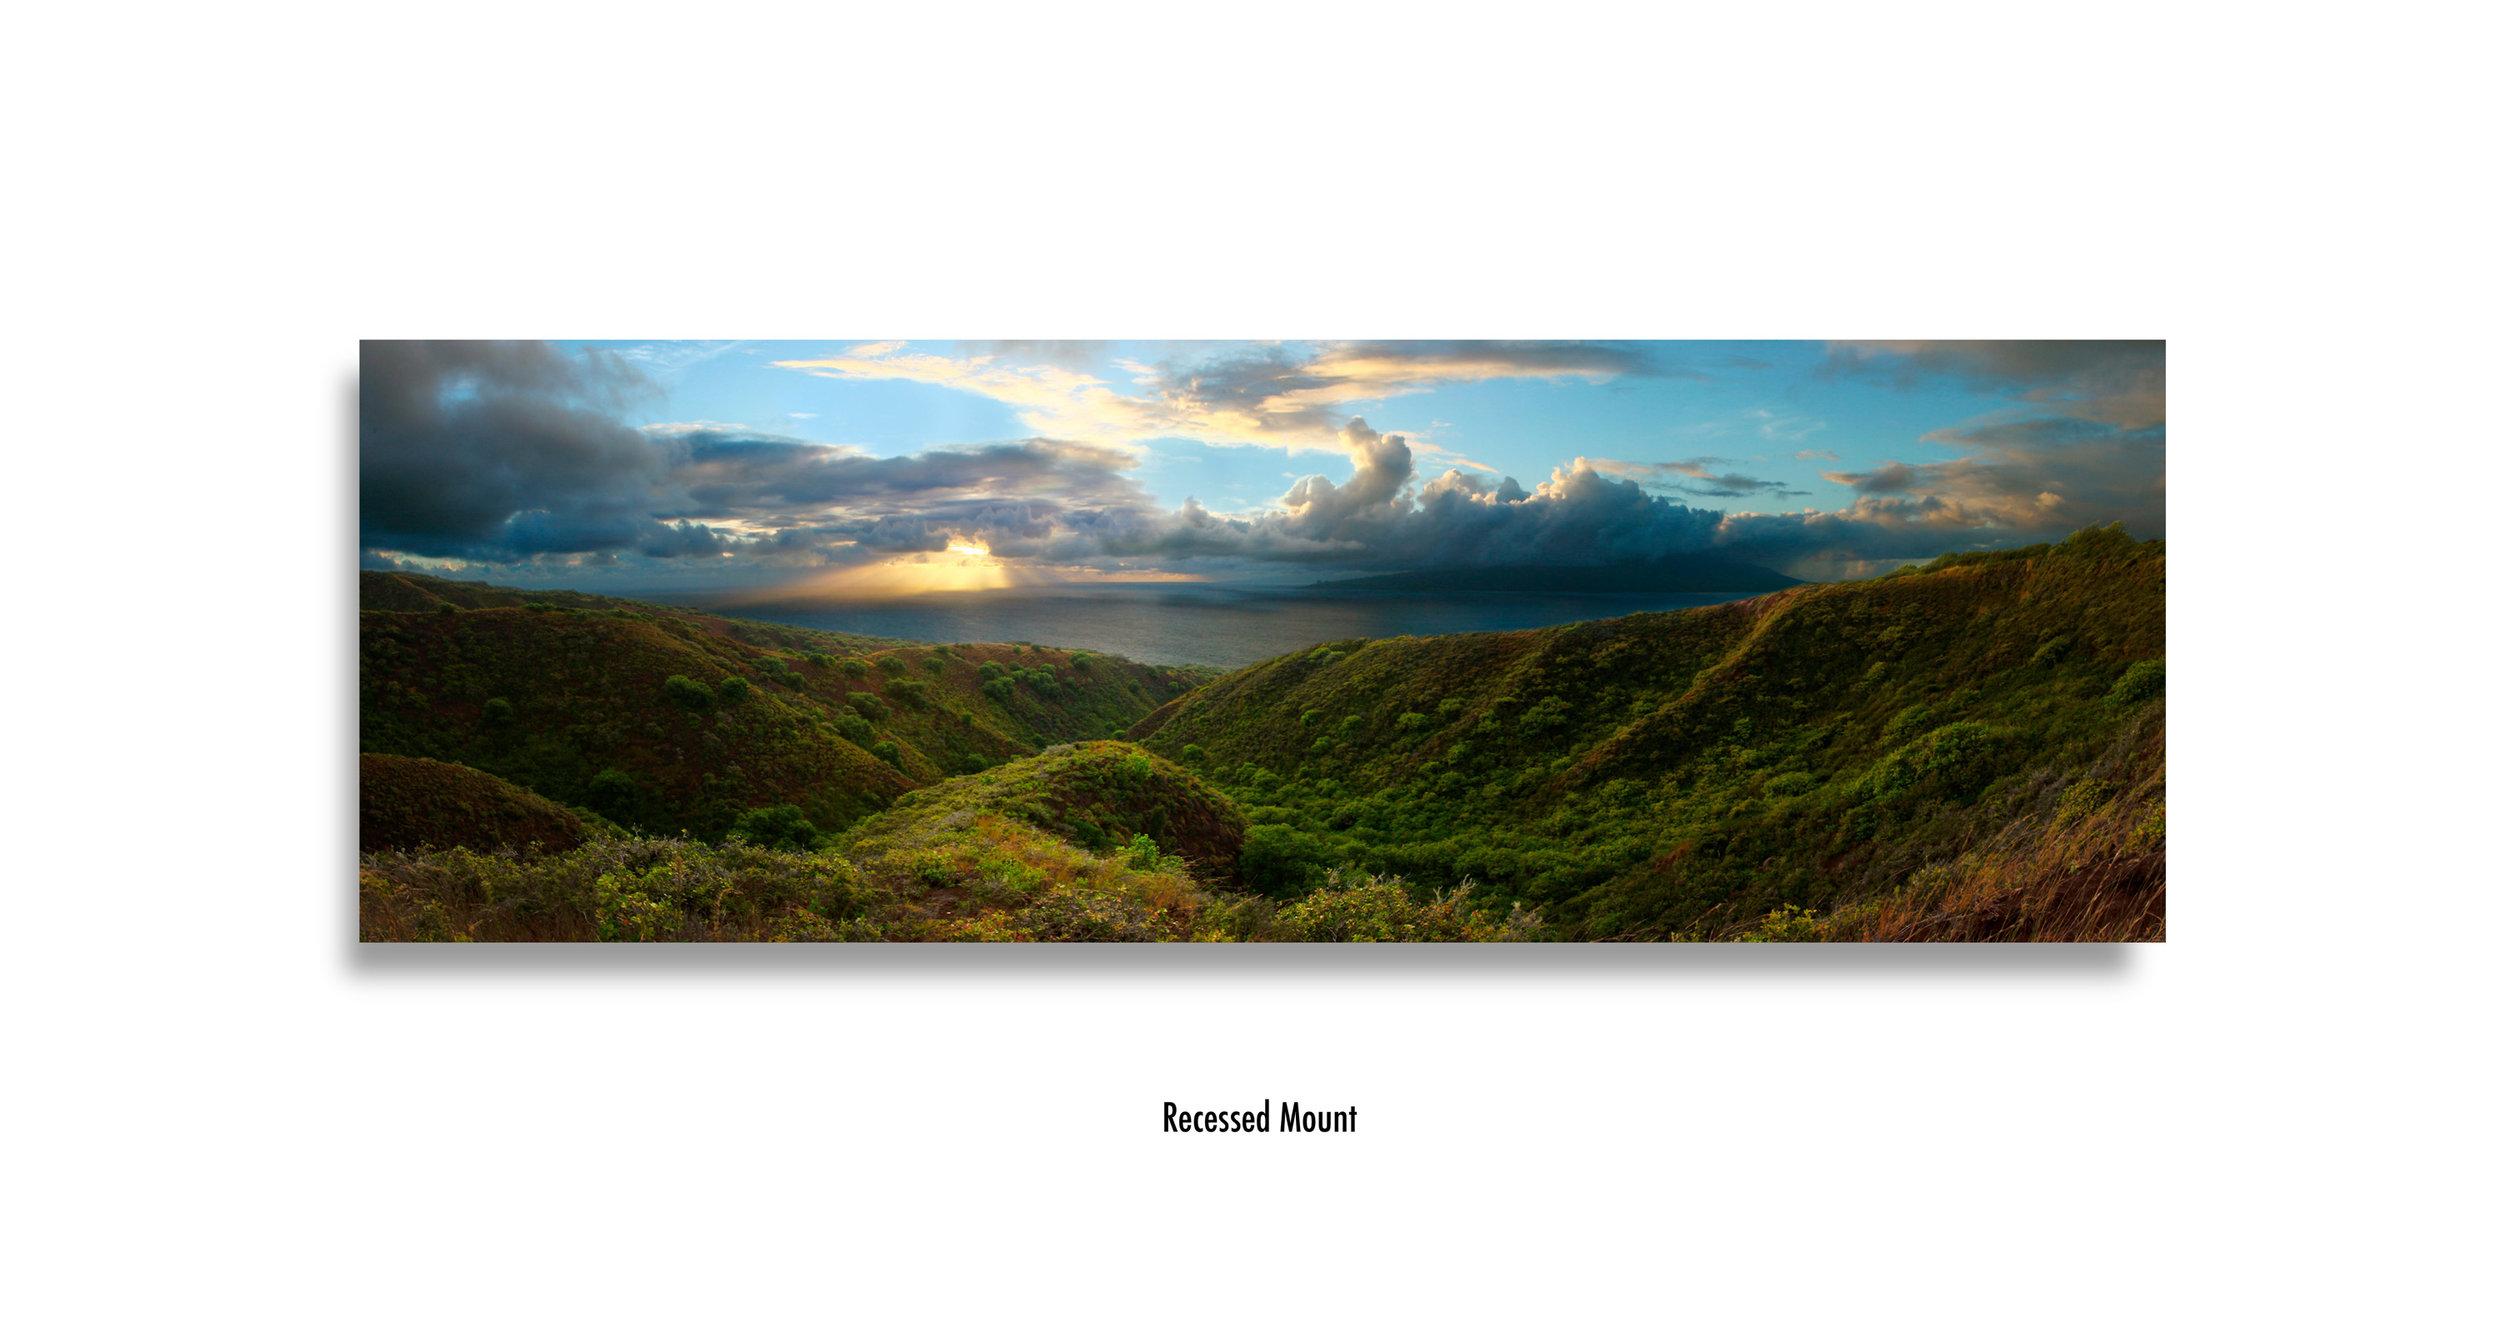 Molokai-Panorama-recessed-mount.jpg